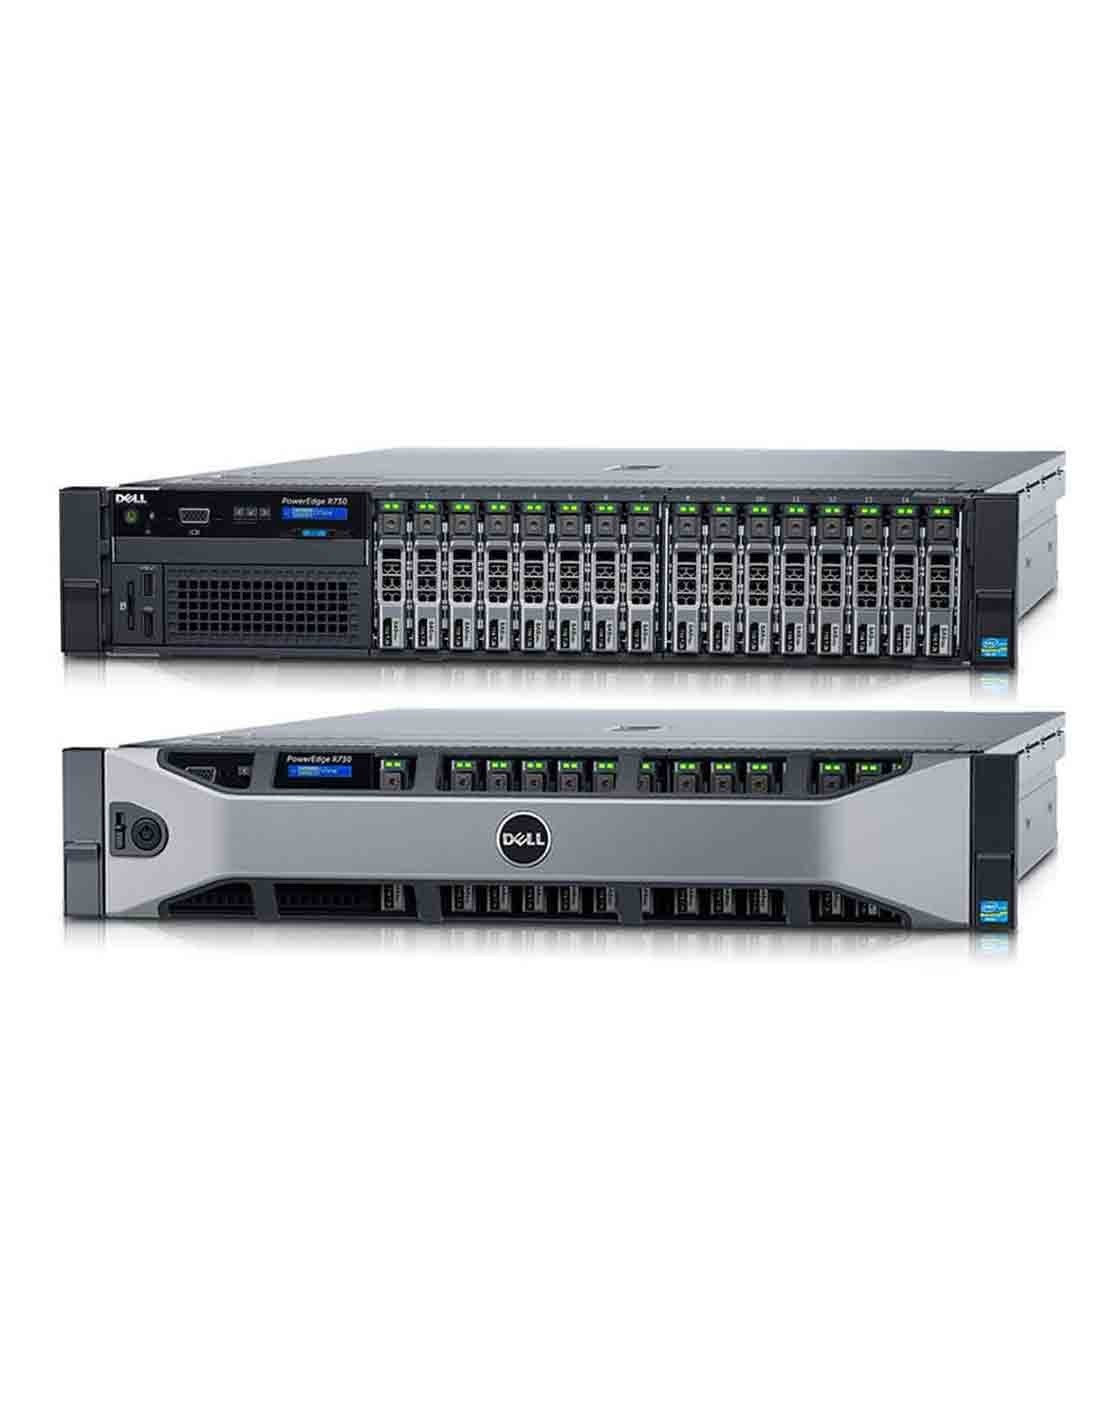 PowerEdge R730 Rack Server with best deal options in Dubai UAE